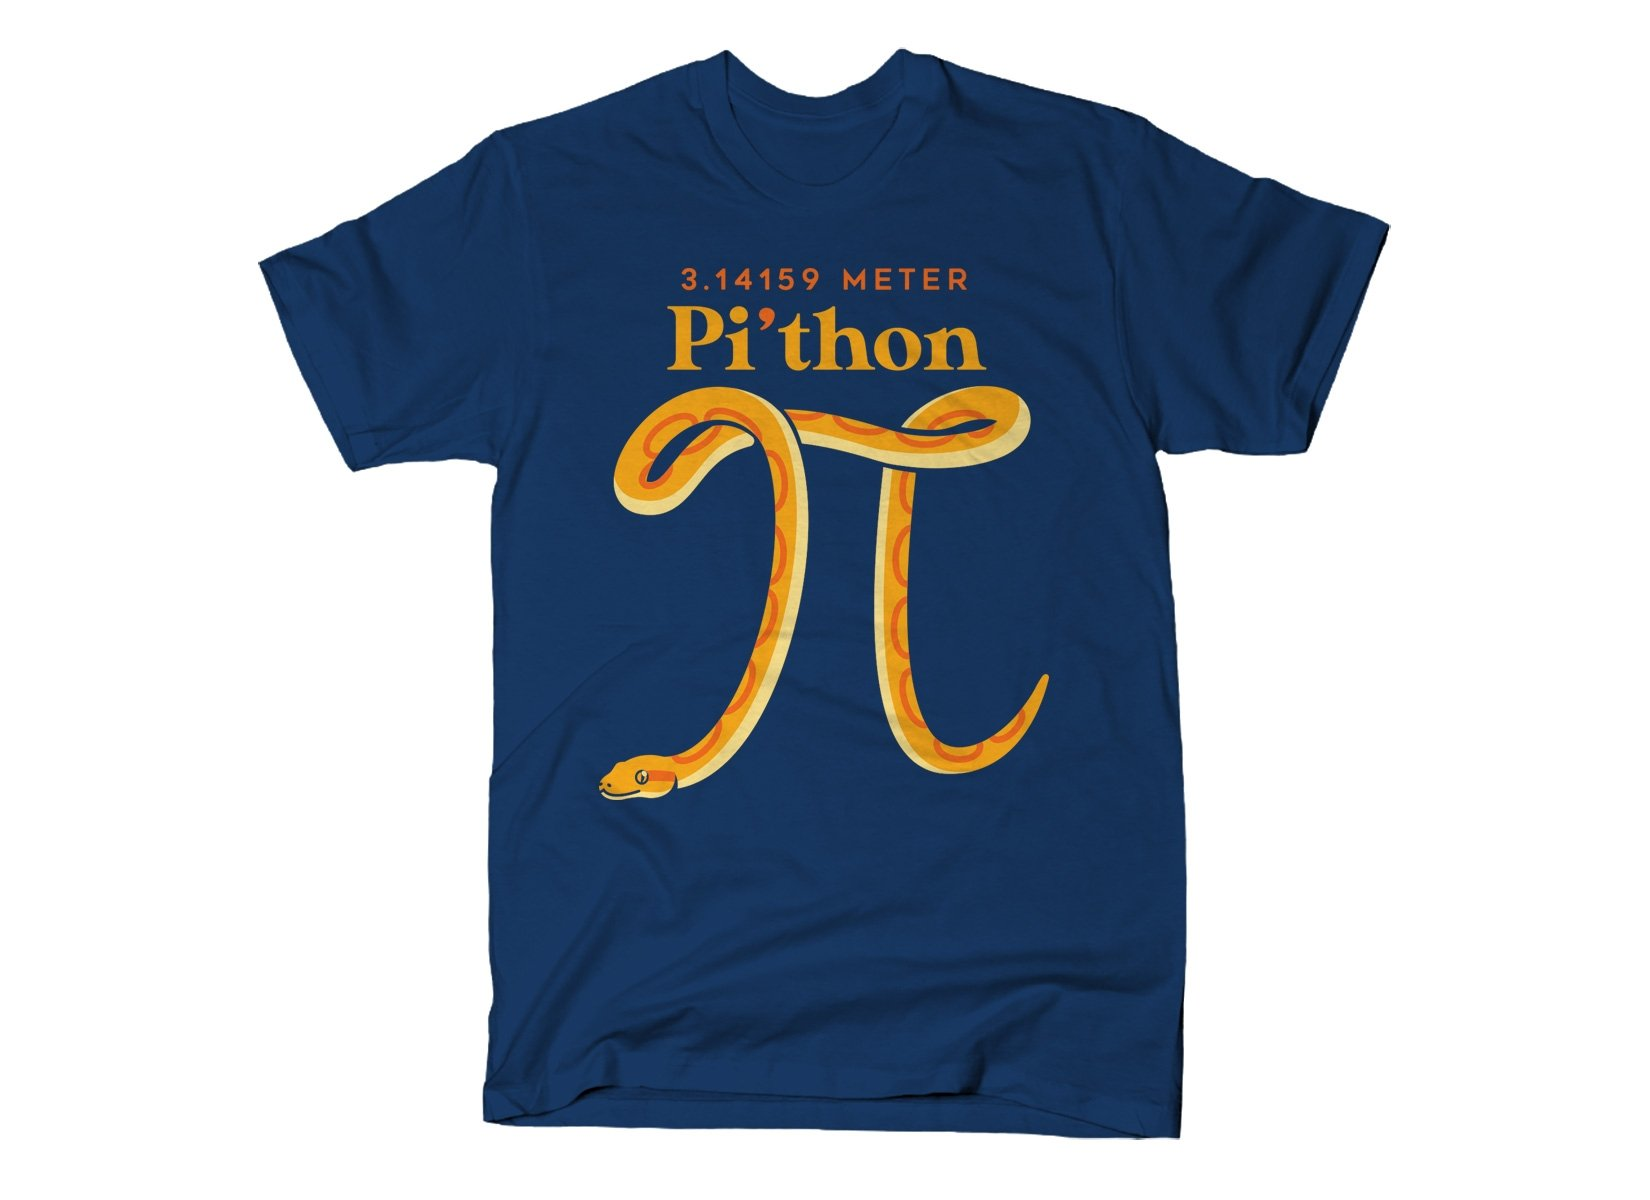 Pi-thon on Mens T-Shirt